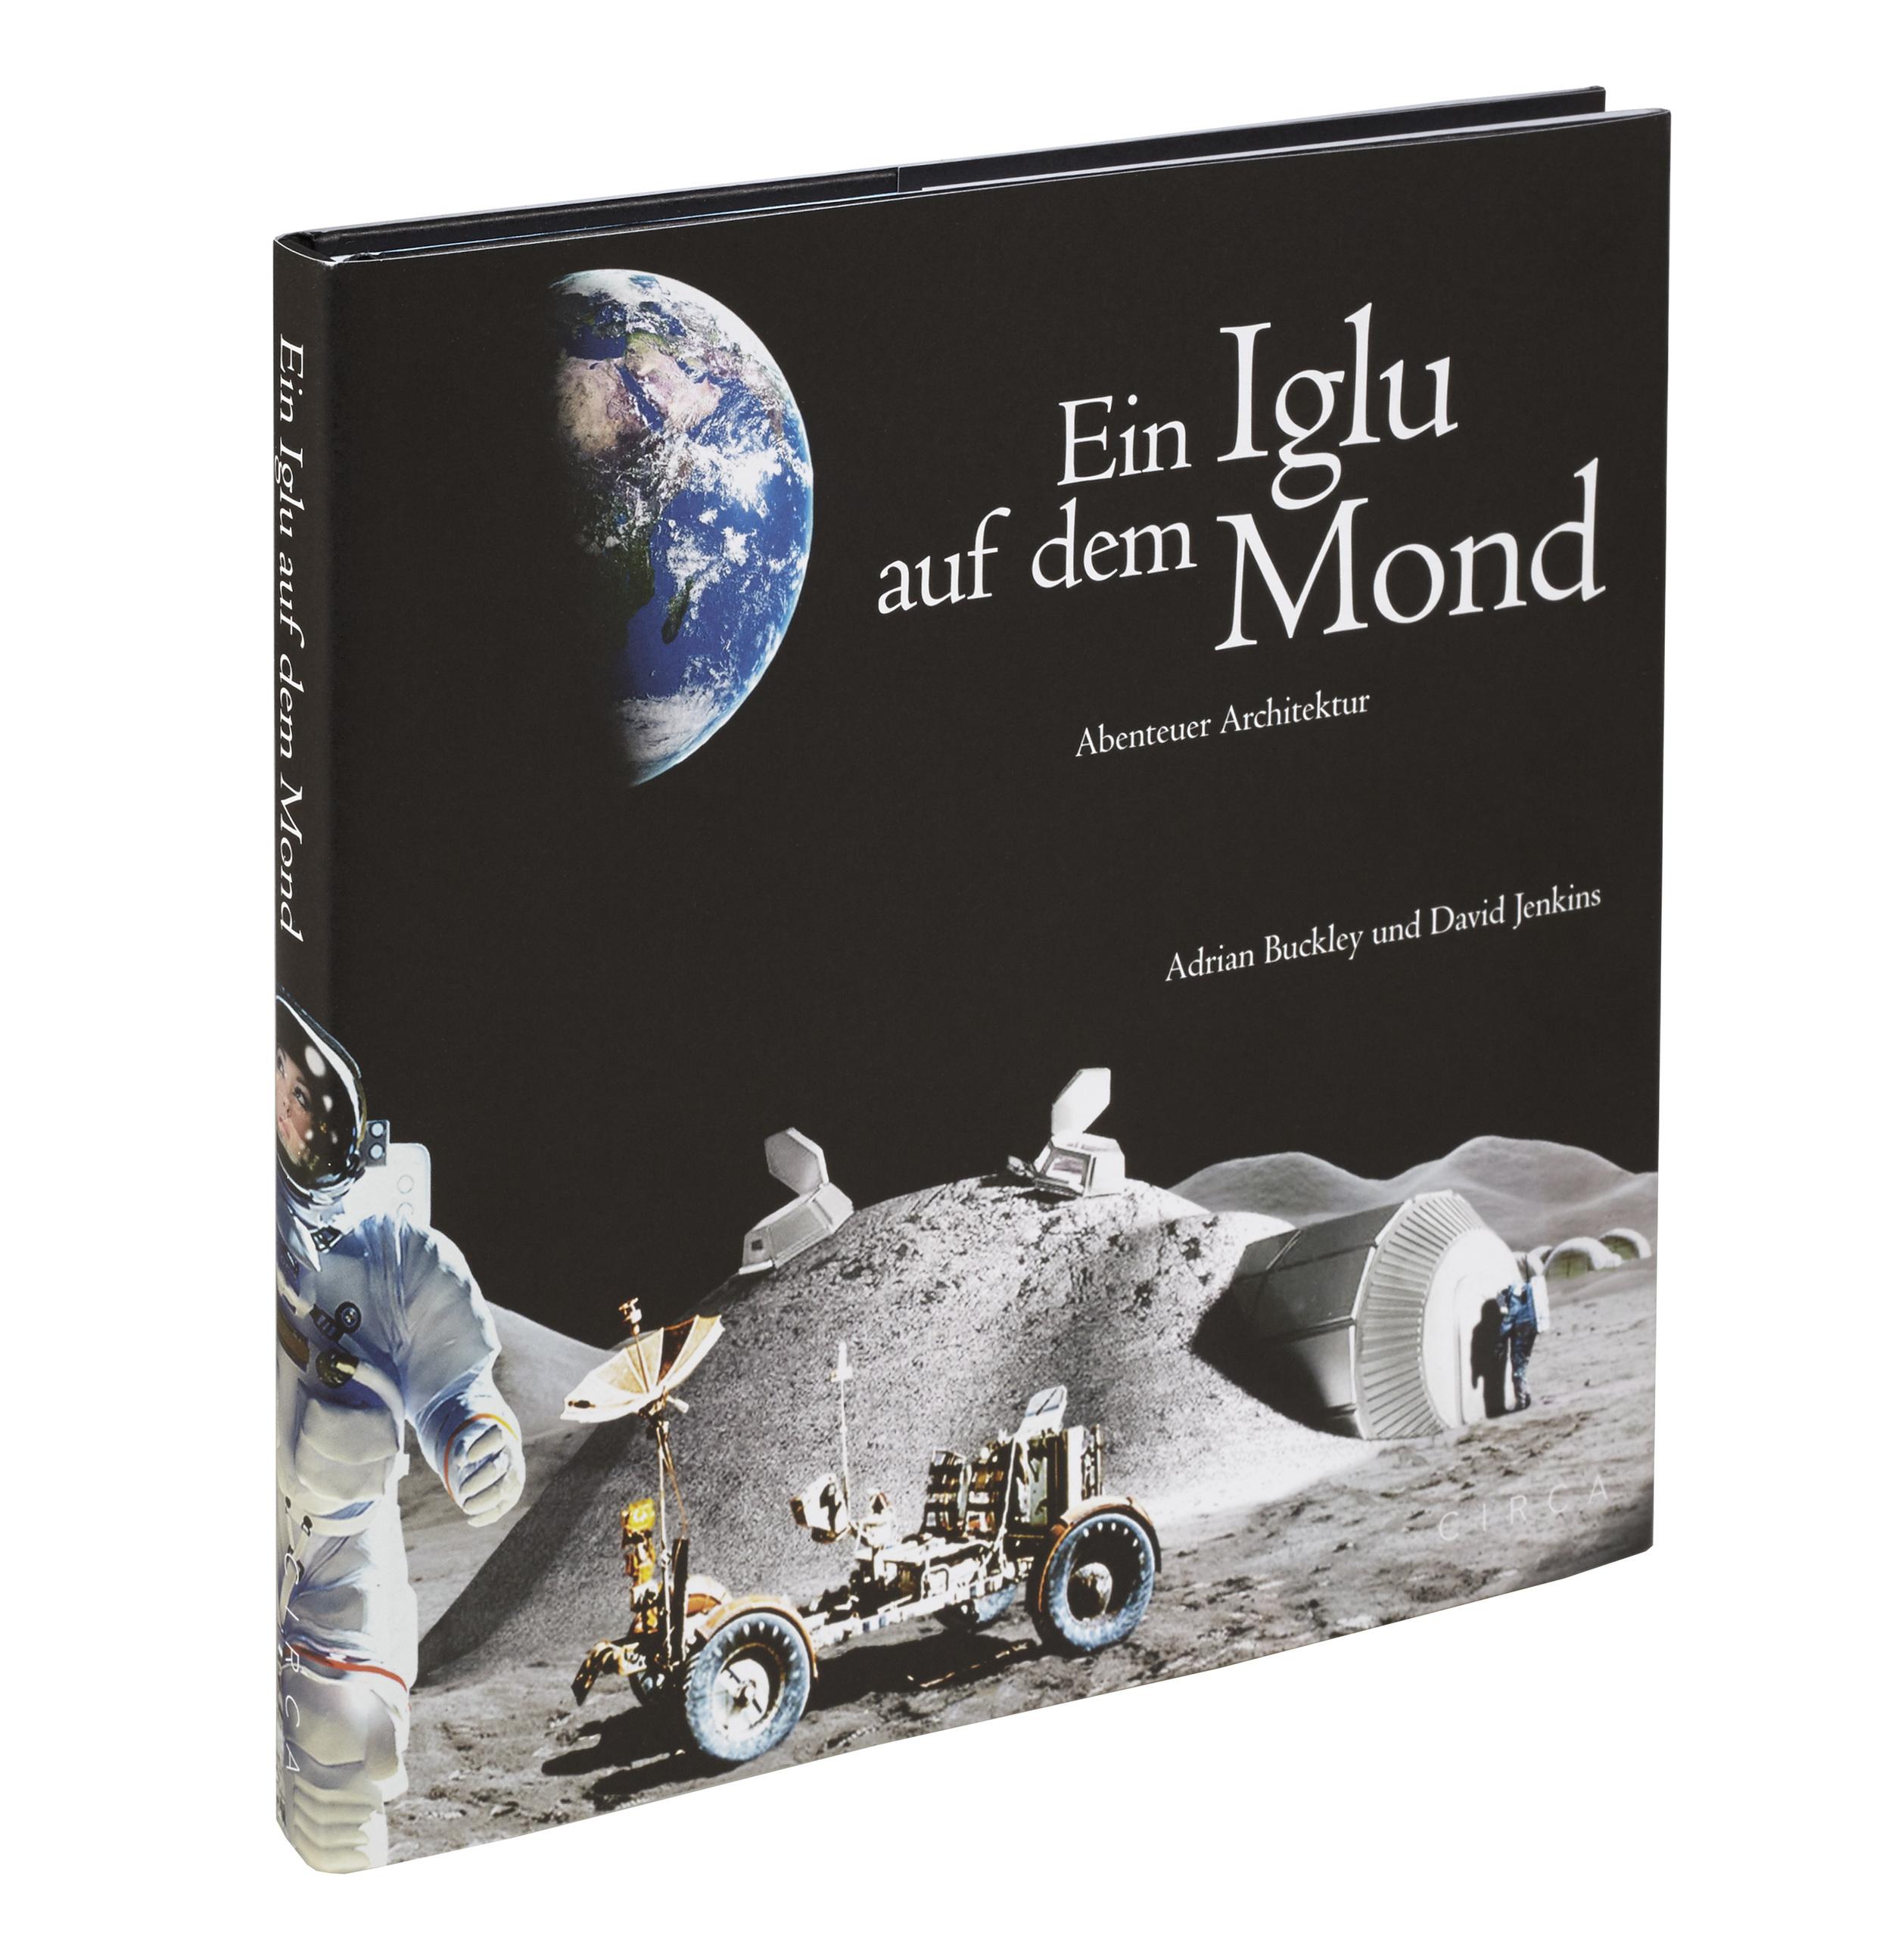 Cover of German Edition, Copyright: CIRCA Press